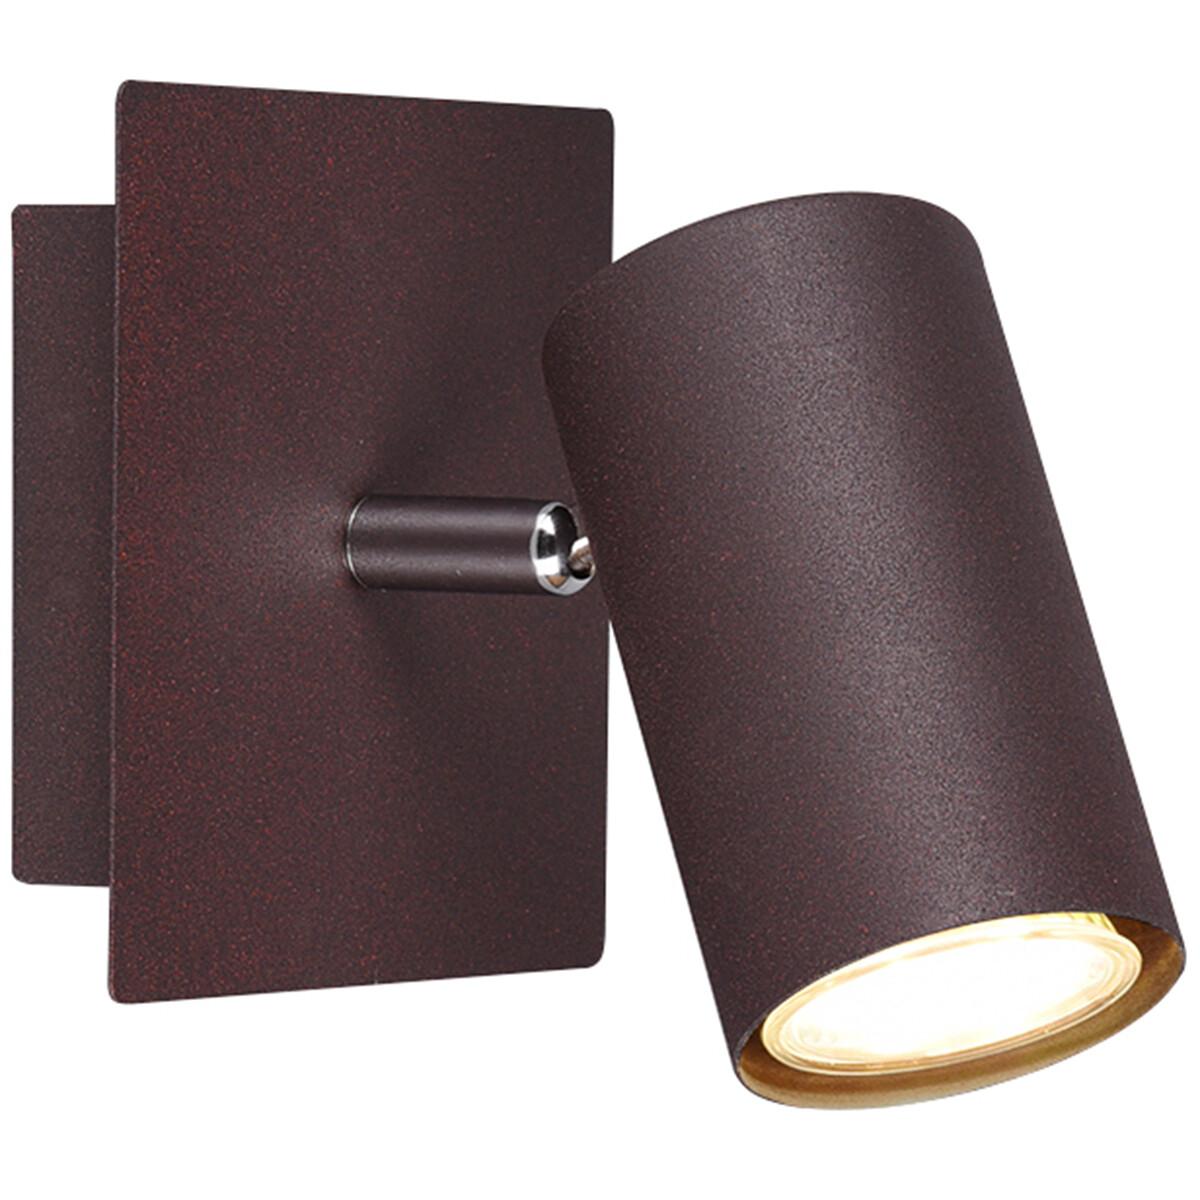 LED Wandspot - Trion Mary - GU10 Fitting - Vierkant - Roestkleur - Aluminium